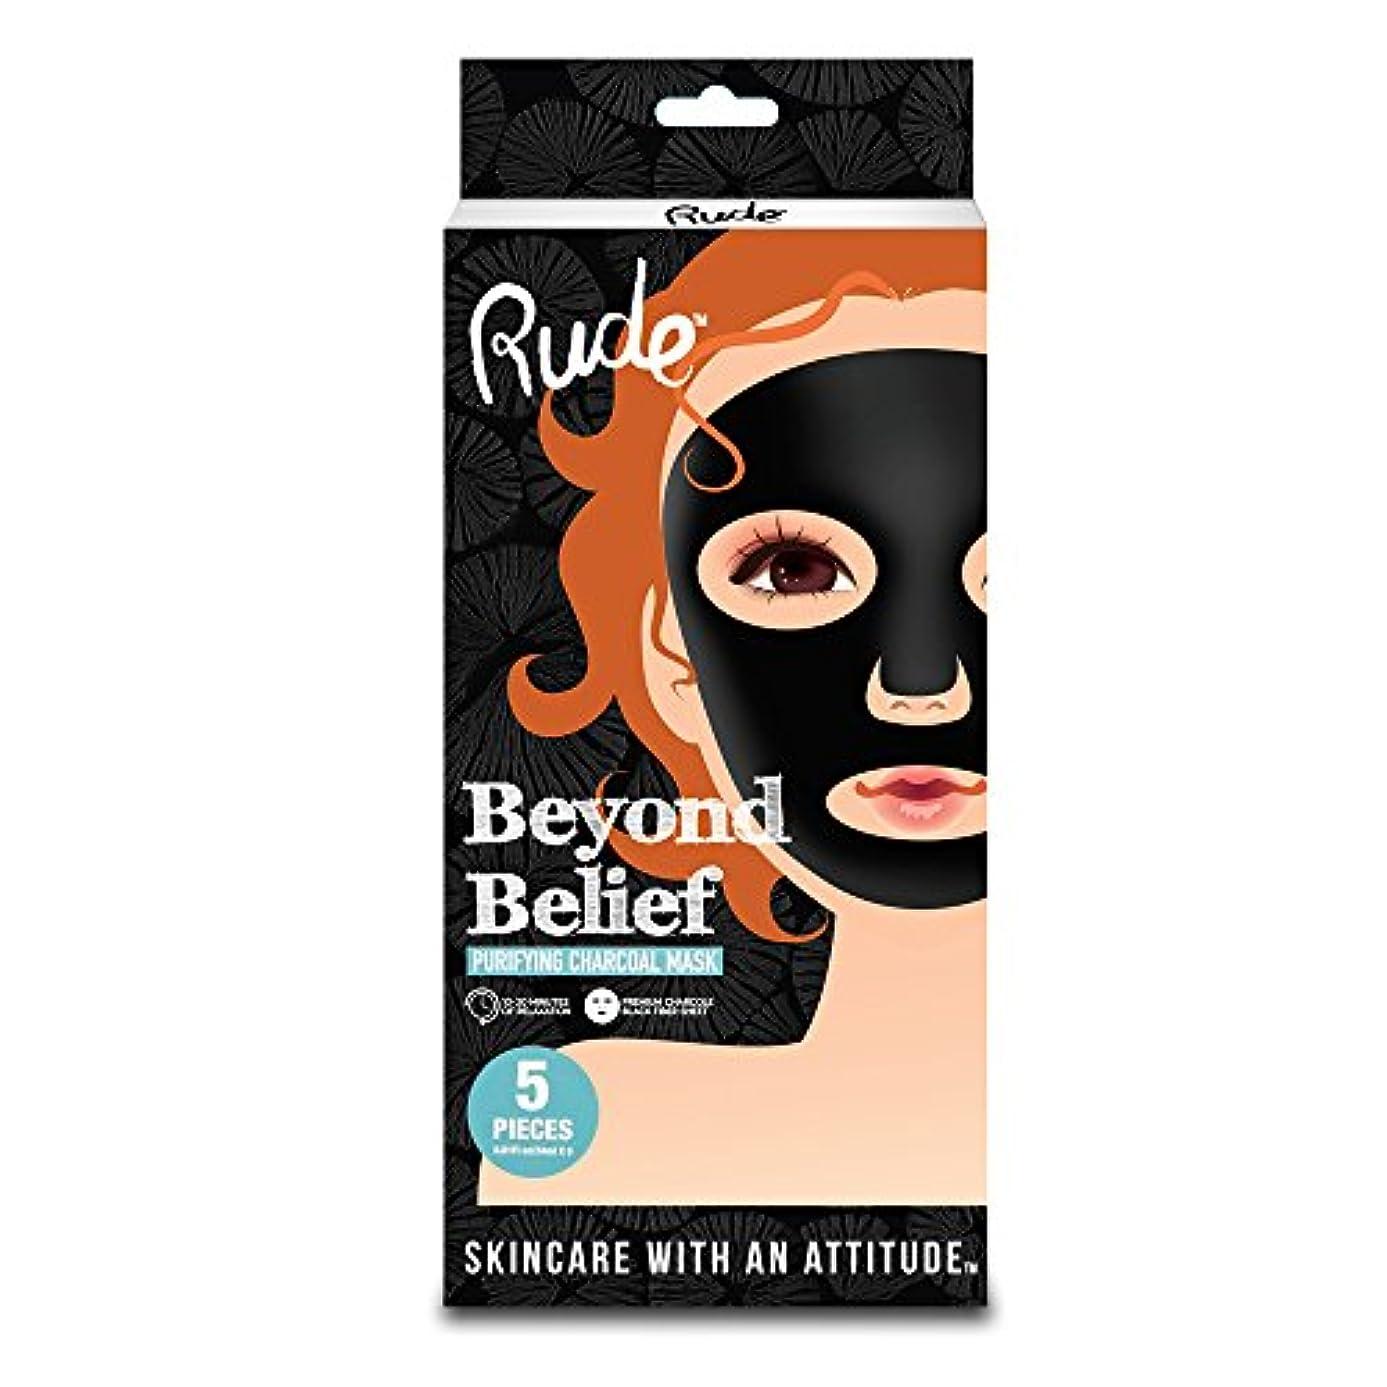 無一文人間容疑者RUDE Beyond Belief Purifying Charcoal Mask 5 Piece Pack (並行輸入品)